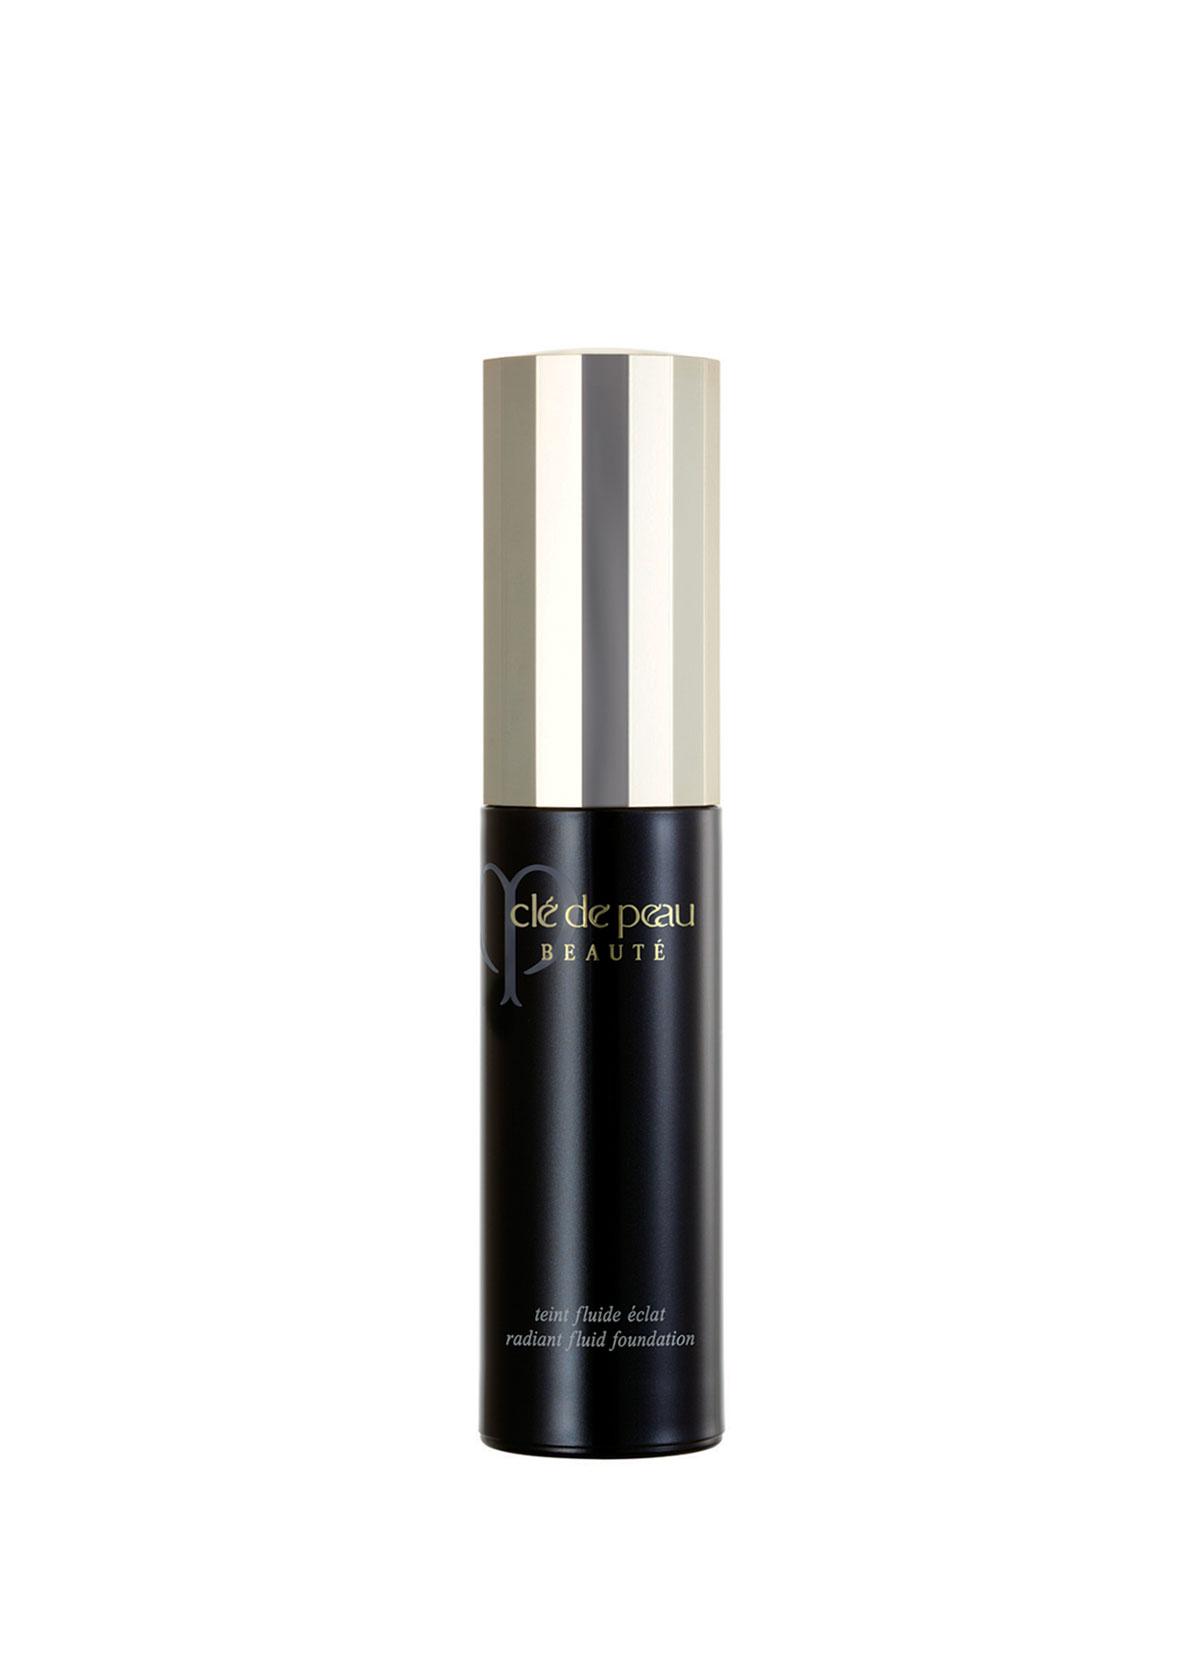 Cle de Peau Beaute Radiant Fluid Foundation SPF 24, 1.0 oz, O30